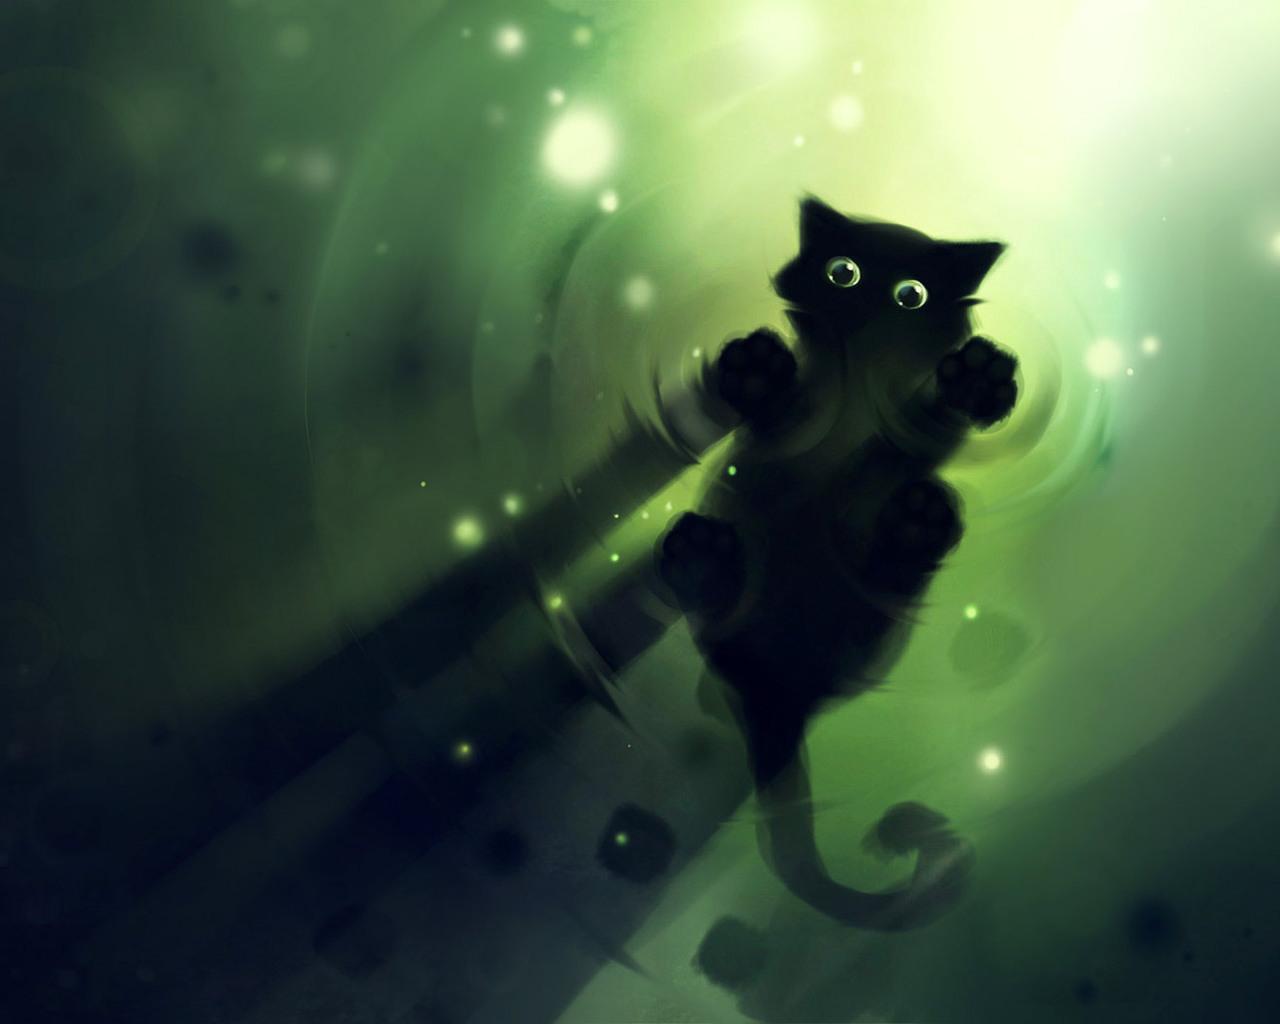 Black Cat 3d coole Bilder - Tuning Wallpaper Hintergrundbilder, Fotos